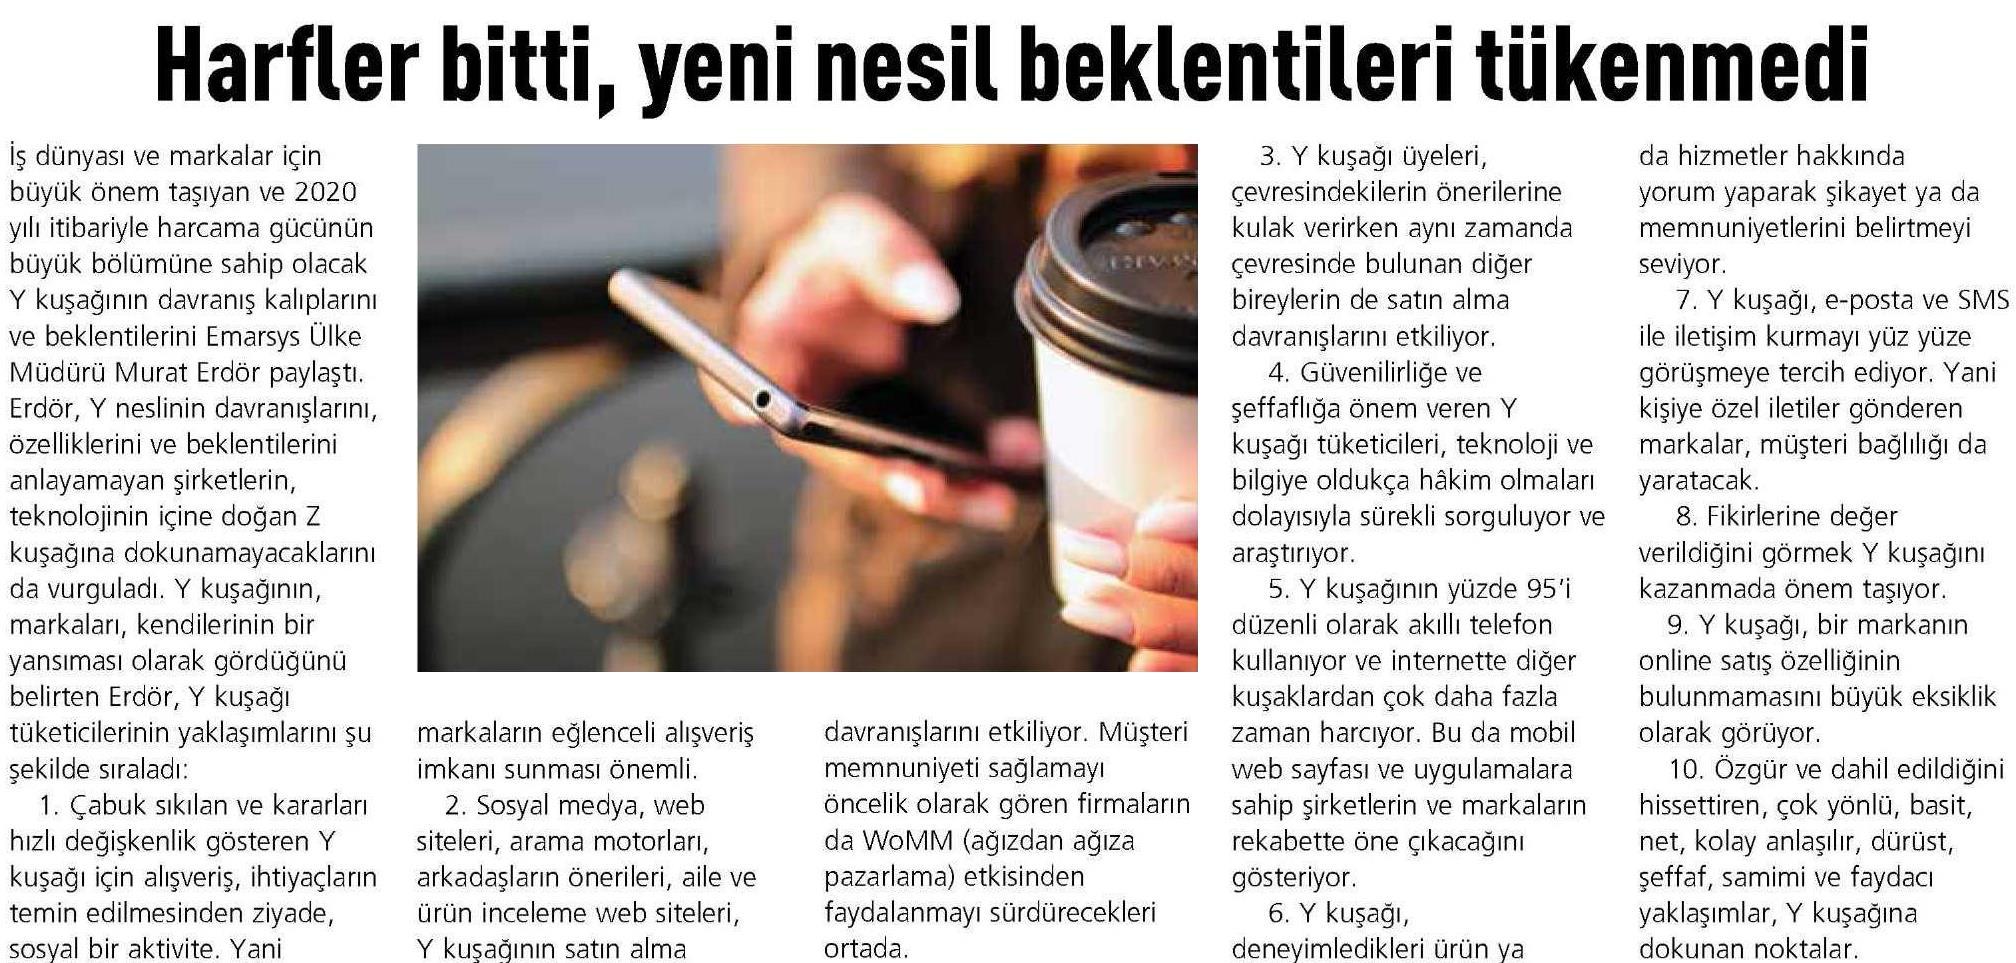 33 - BT Haber Gazetesi_muraterdor.com_3.8.2015